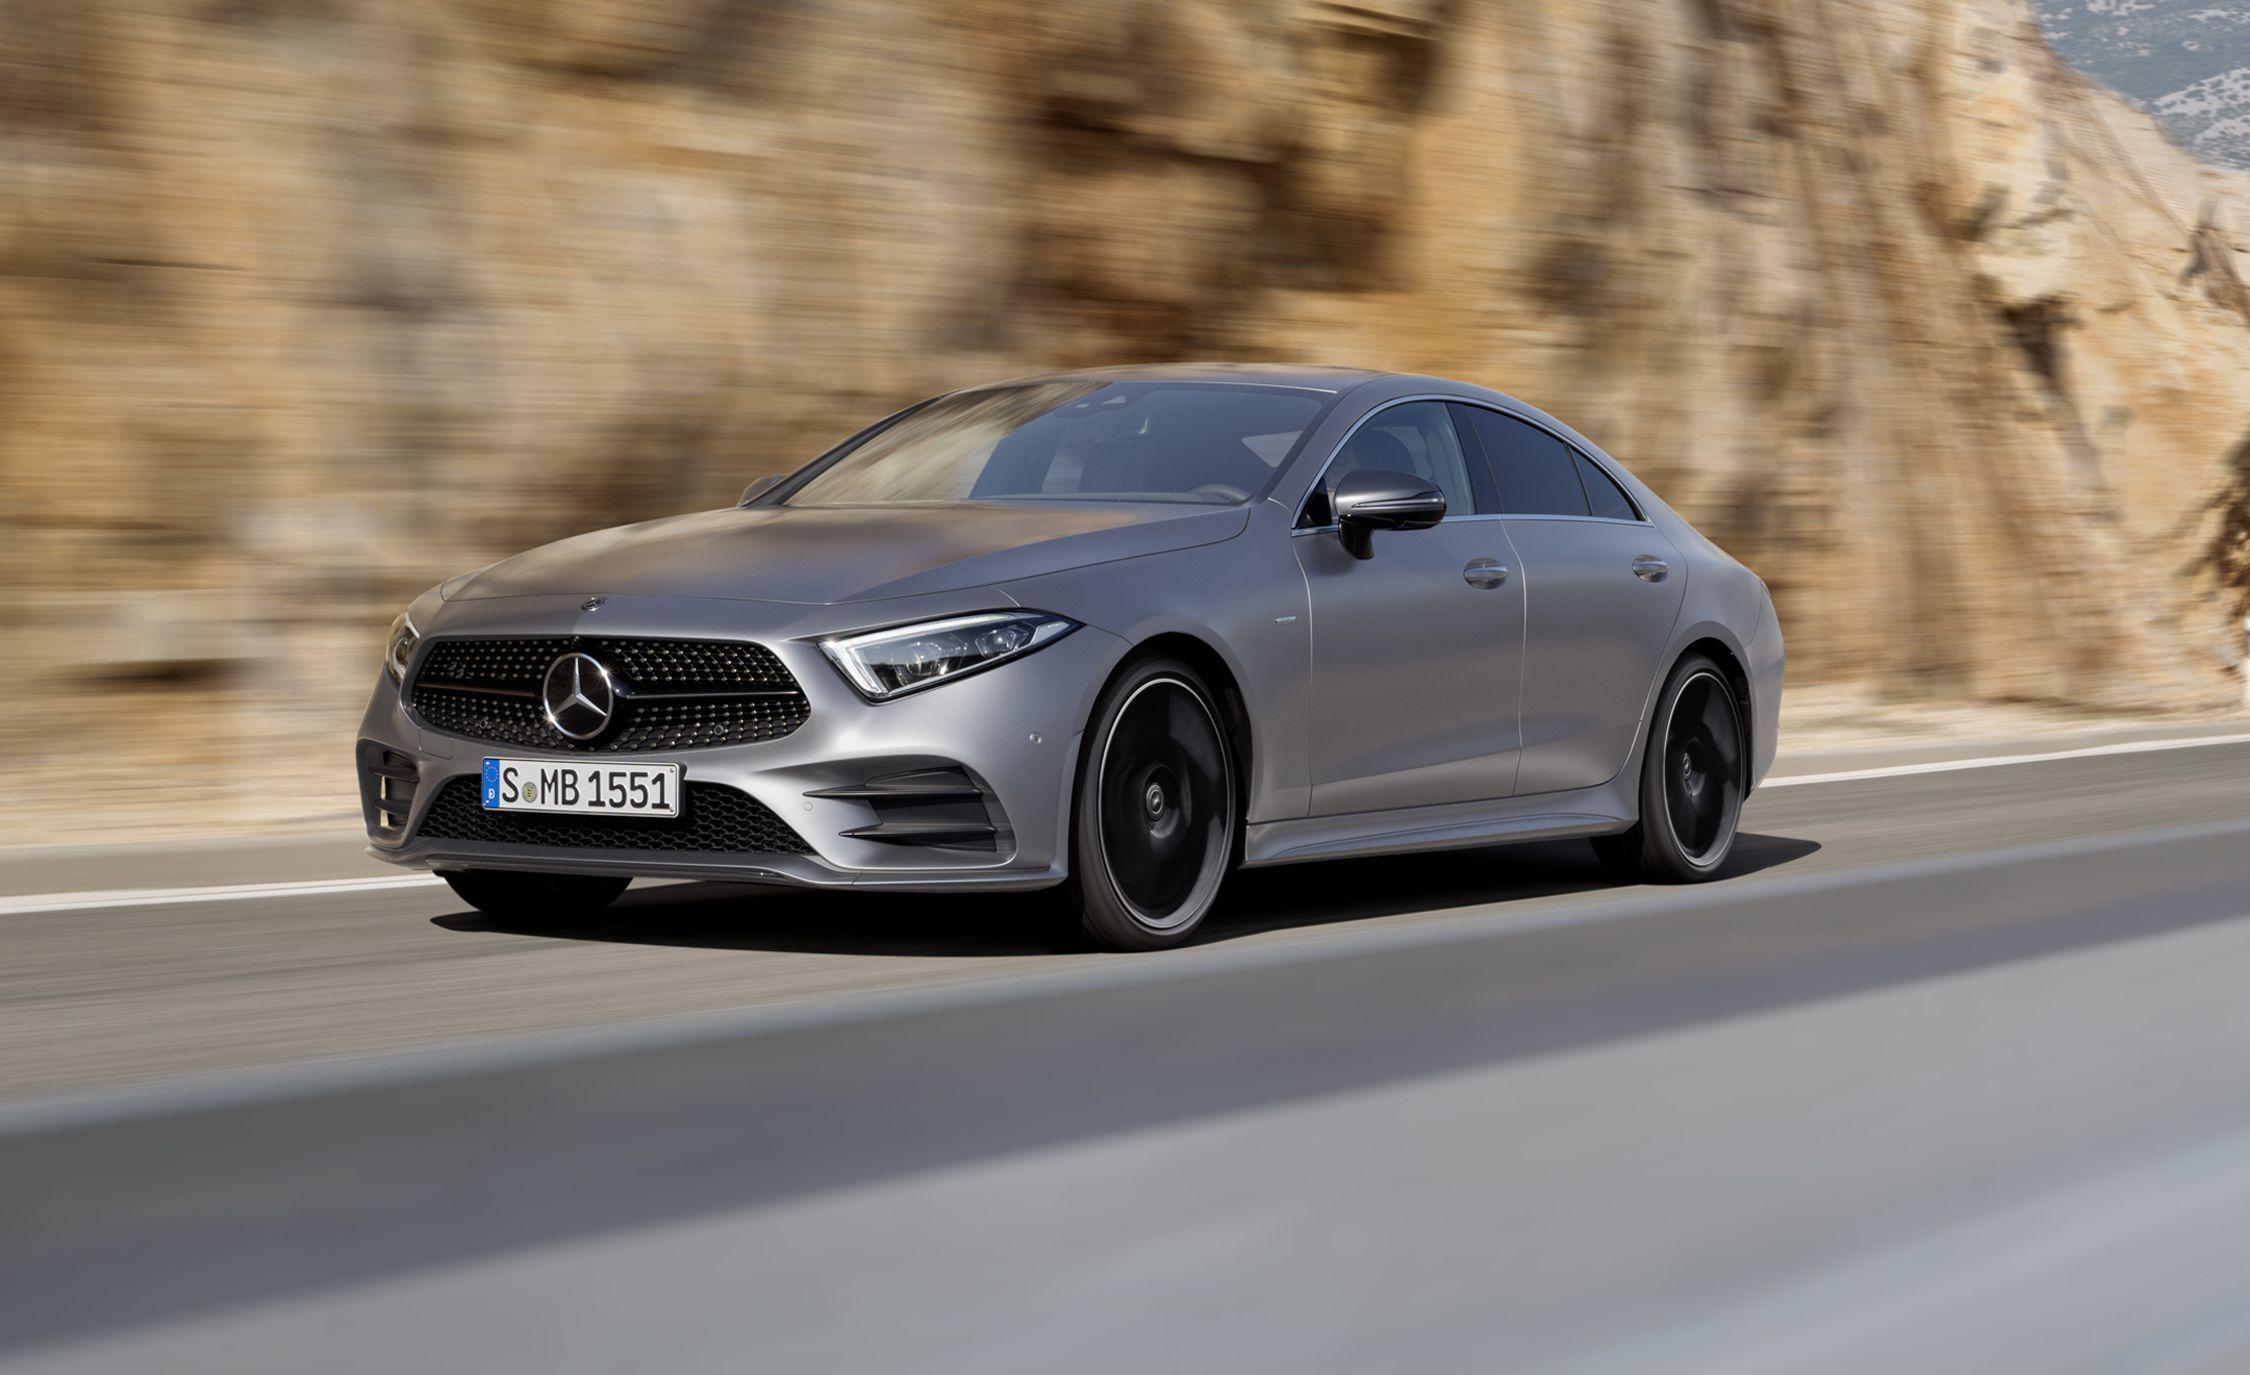 best 2019 mercedes cls class specs cars picture mercedes benz rh pinterest com